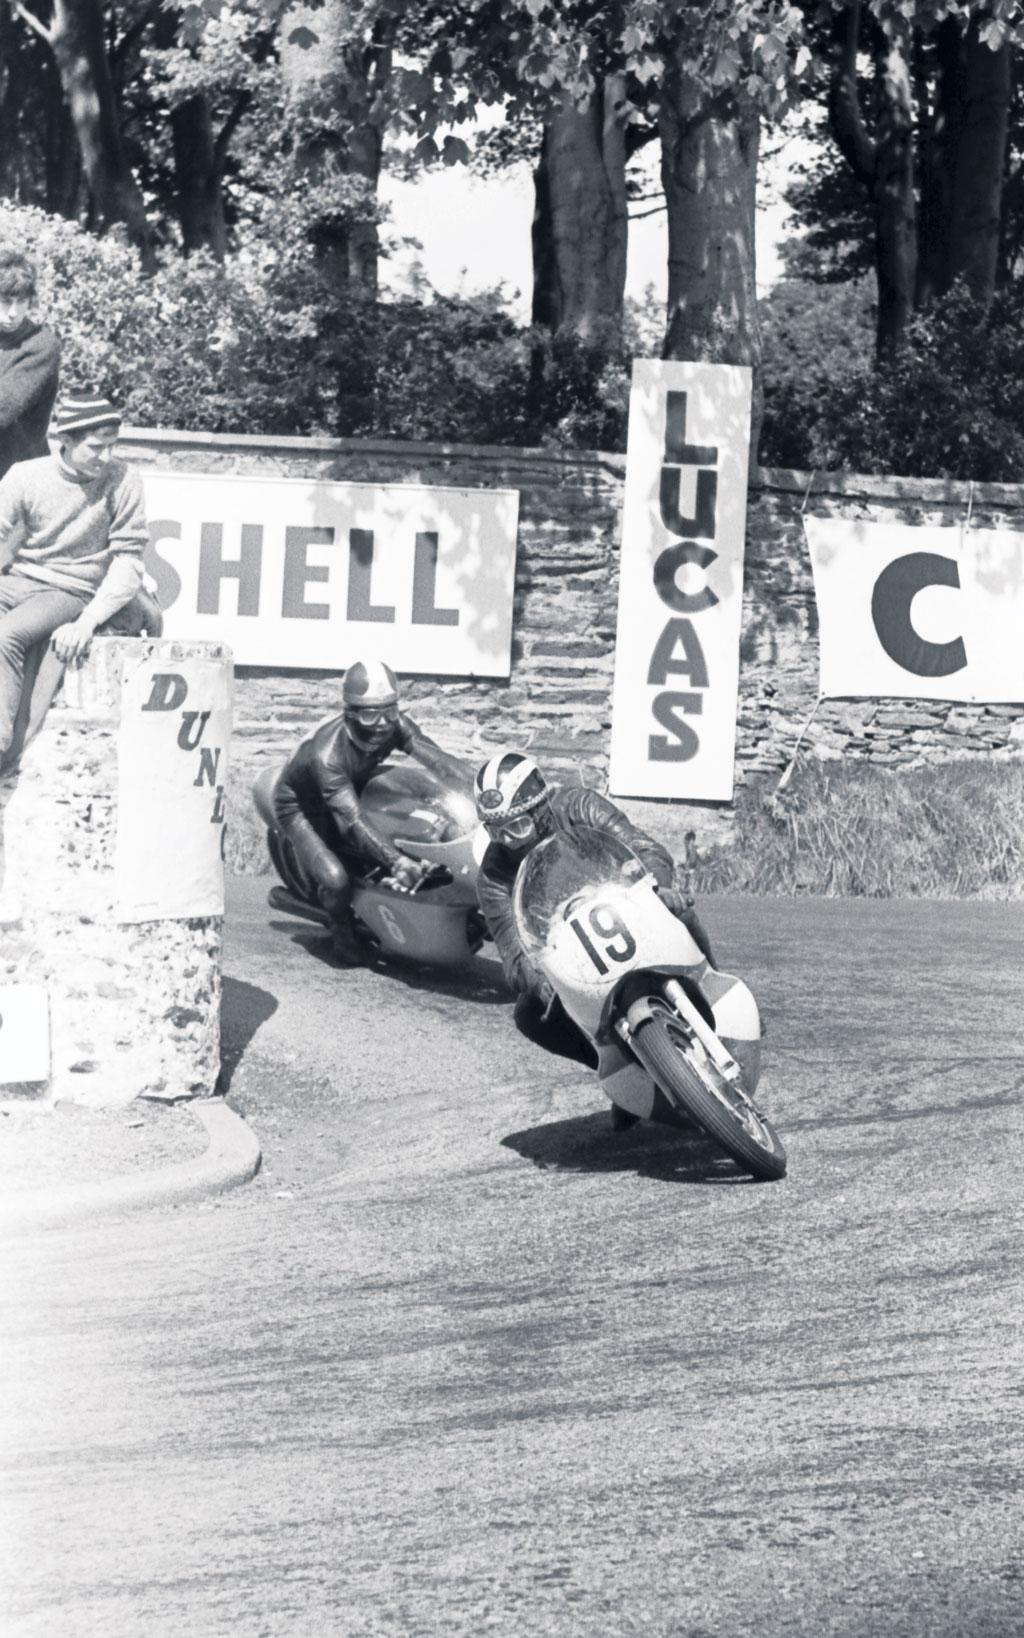 1965 350 TT Isle of Man Phil Read leads Giacomo Agostini on MV.